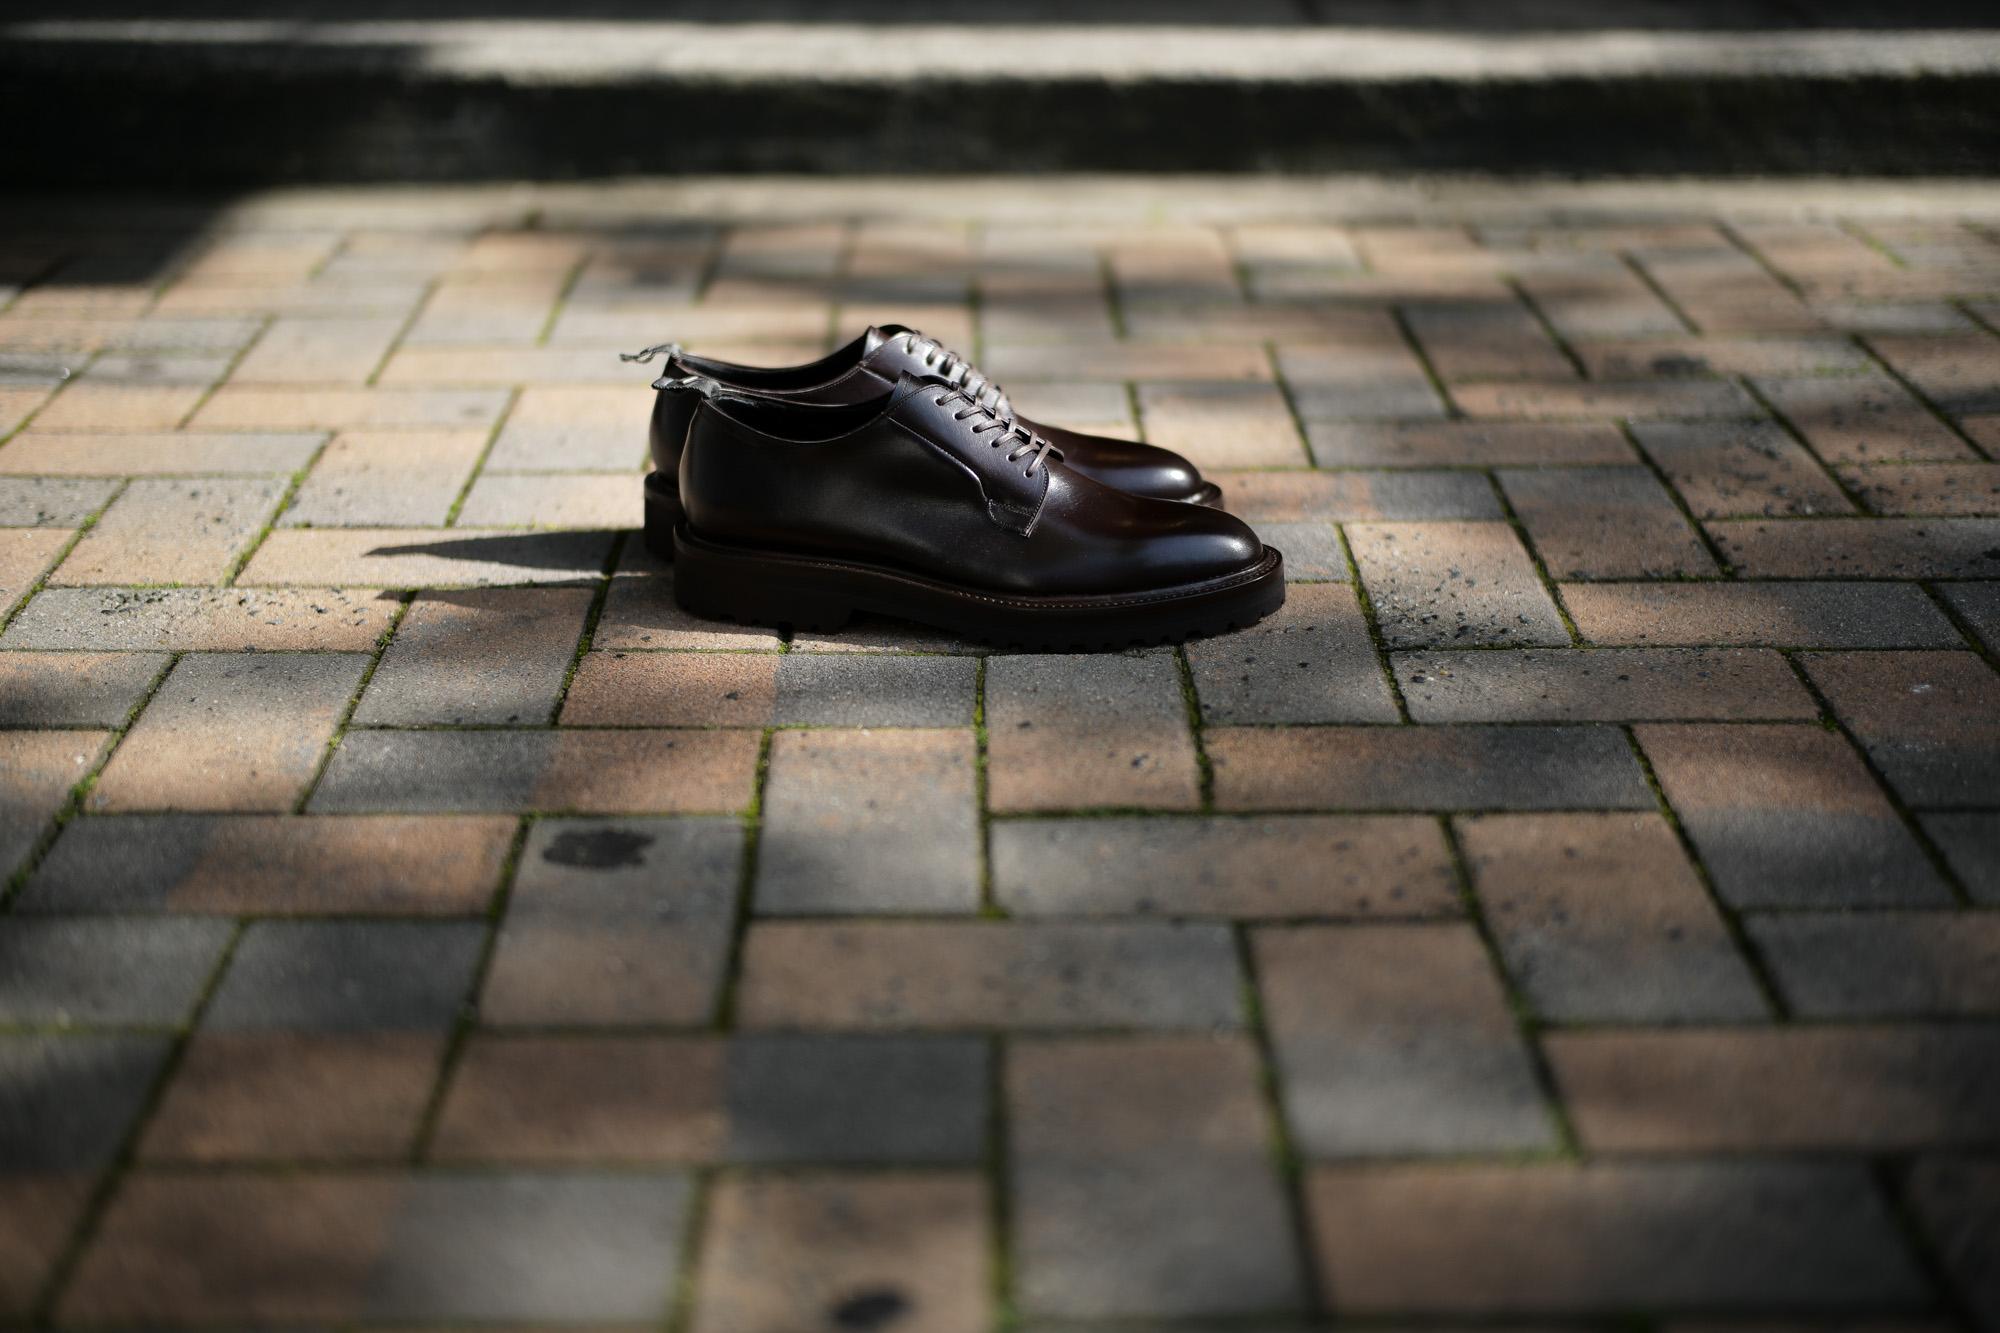 WH(ダブルエイチ) WH-0001(WHS-0001) Plane Toe Shoes (干場氏 スペシャル モデル) Cruise Last (クルーズラスト) ANNONAY Vocalou Calf Leather プレーントゥシューズ DARK BROWN (ダークブラウン) MADE IN JAPAN(日本製) 2018 春夏新作   【干場氏、坪内氏の直筆サイン入り】【Alto e Diritto限定 スペシャルアイテム】 wh 干場さん 干場スペシャル FORZASTYLE フォルザスタイル 愛知 名古屋 Alto e Diritto アルト エ デリット